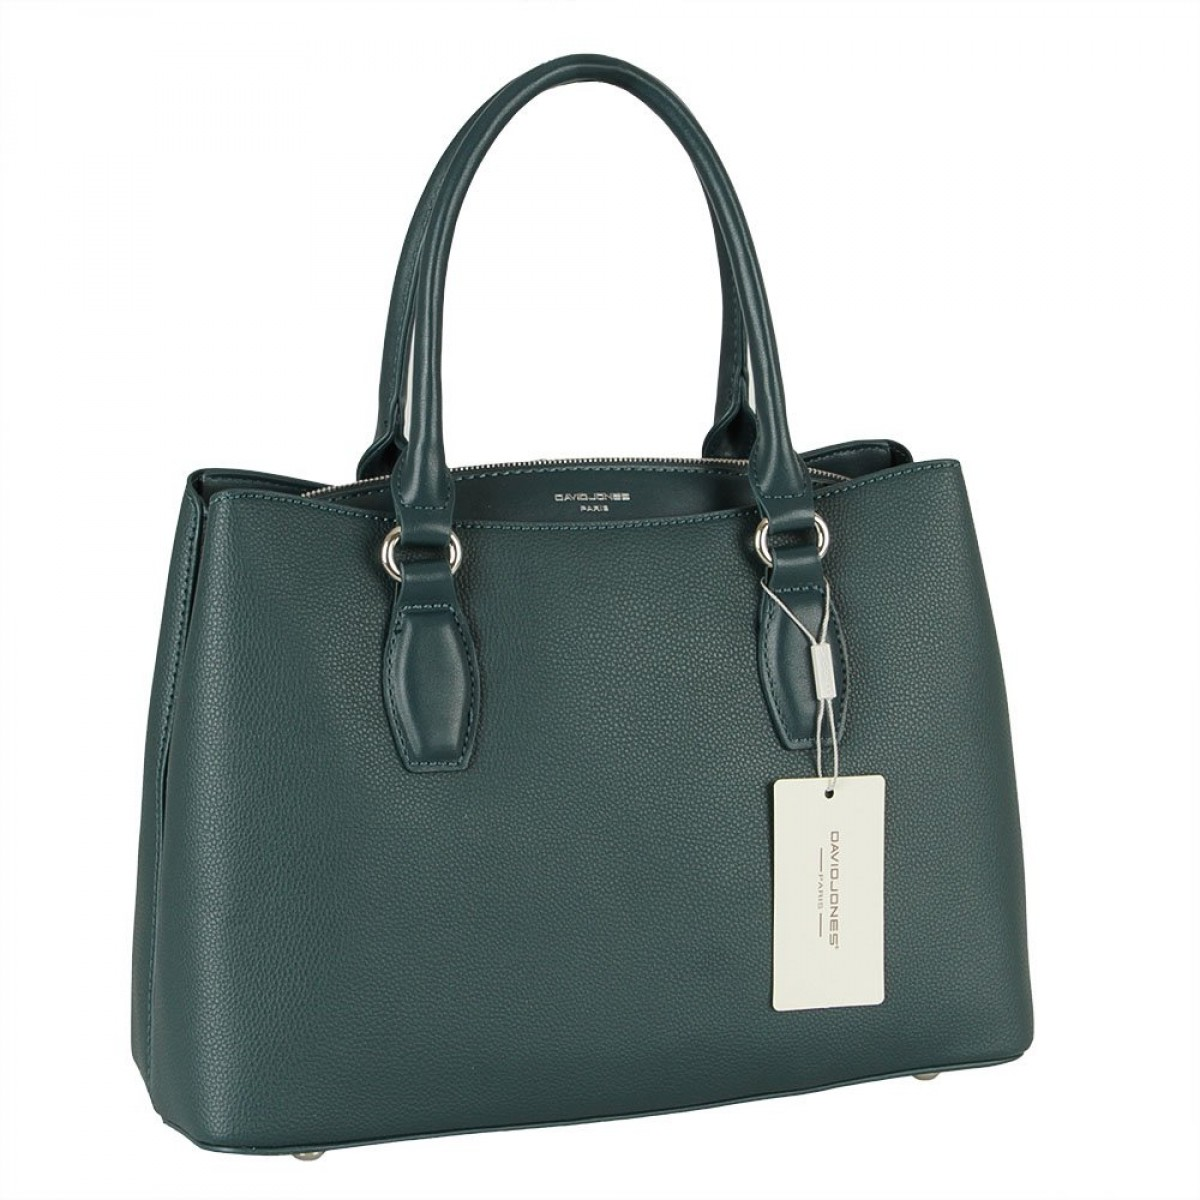 Жіноча сумка David Jones CM5836 PEACOCK BLUE